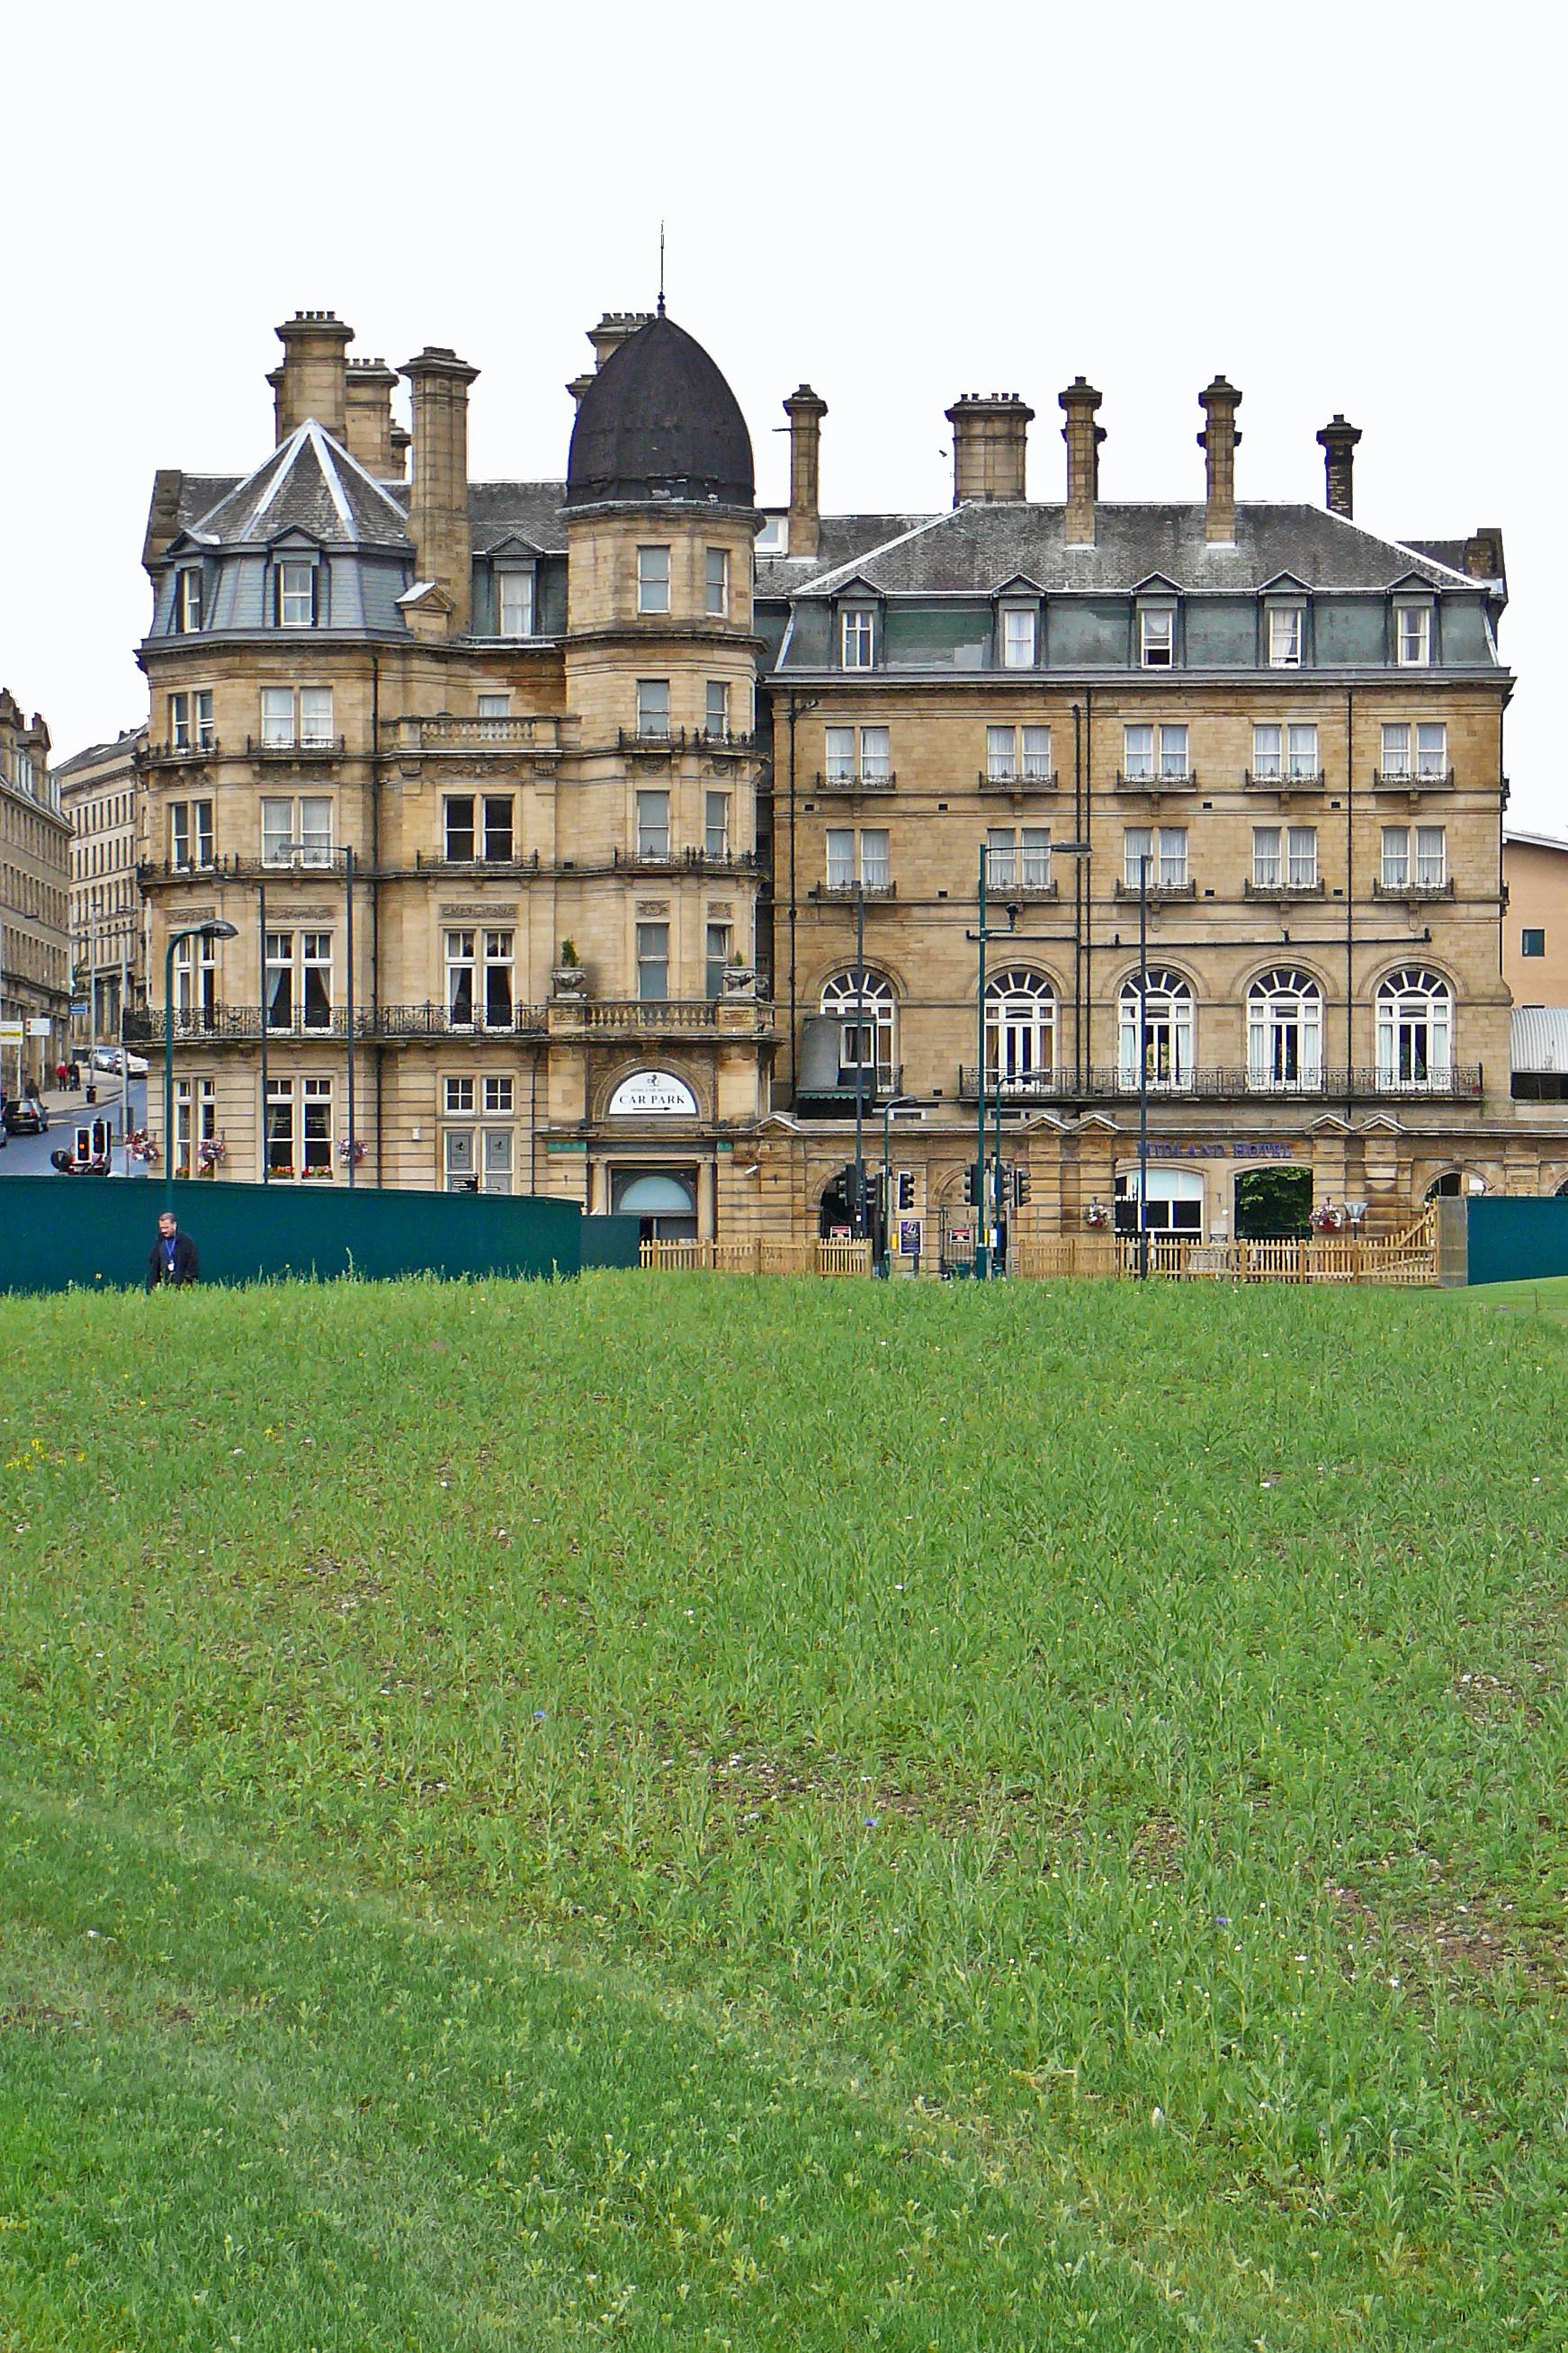 File:Urban garden and the Midland Hotel, Bradford.jpg - Wikimedia ...